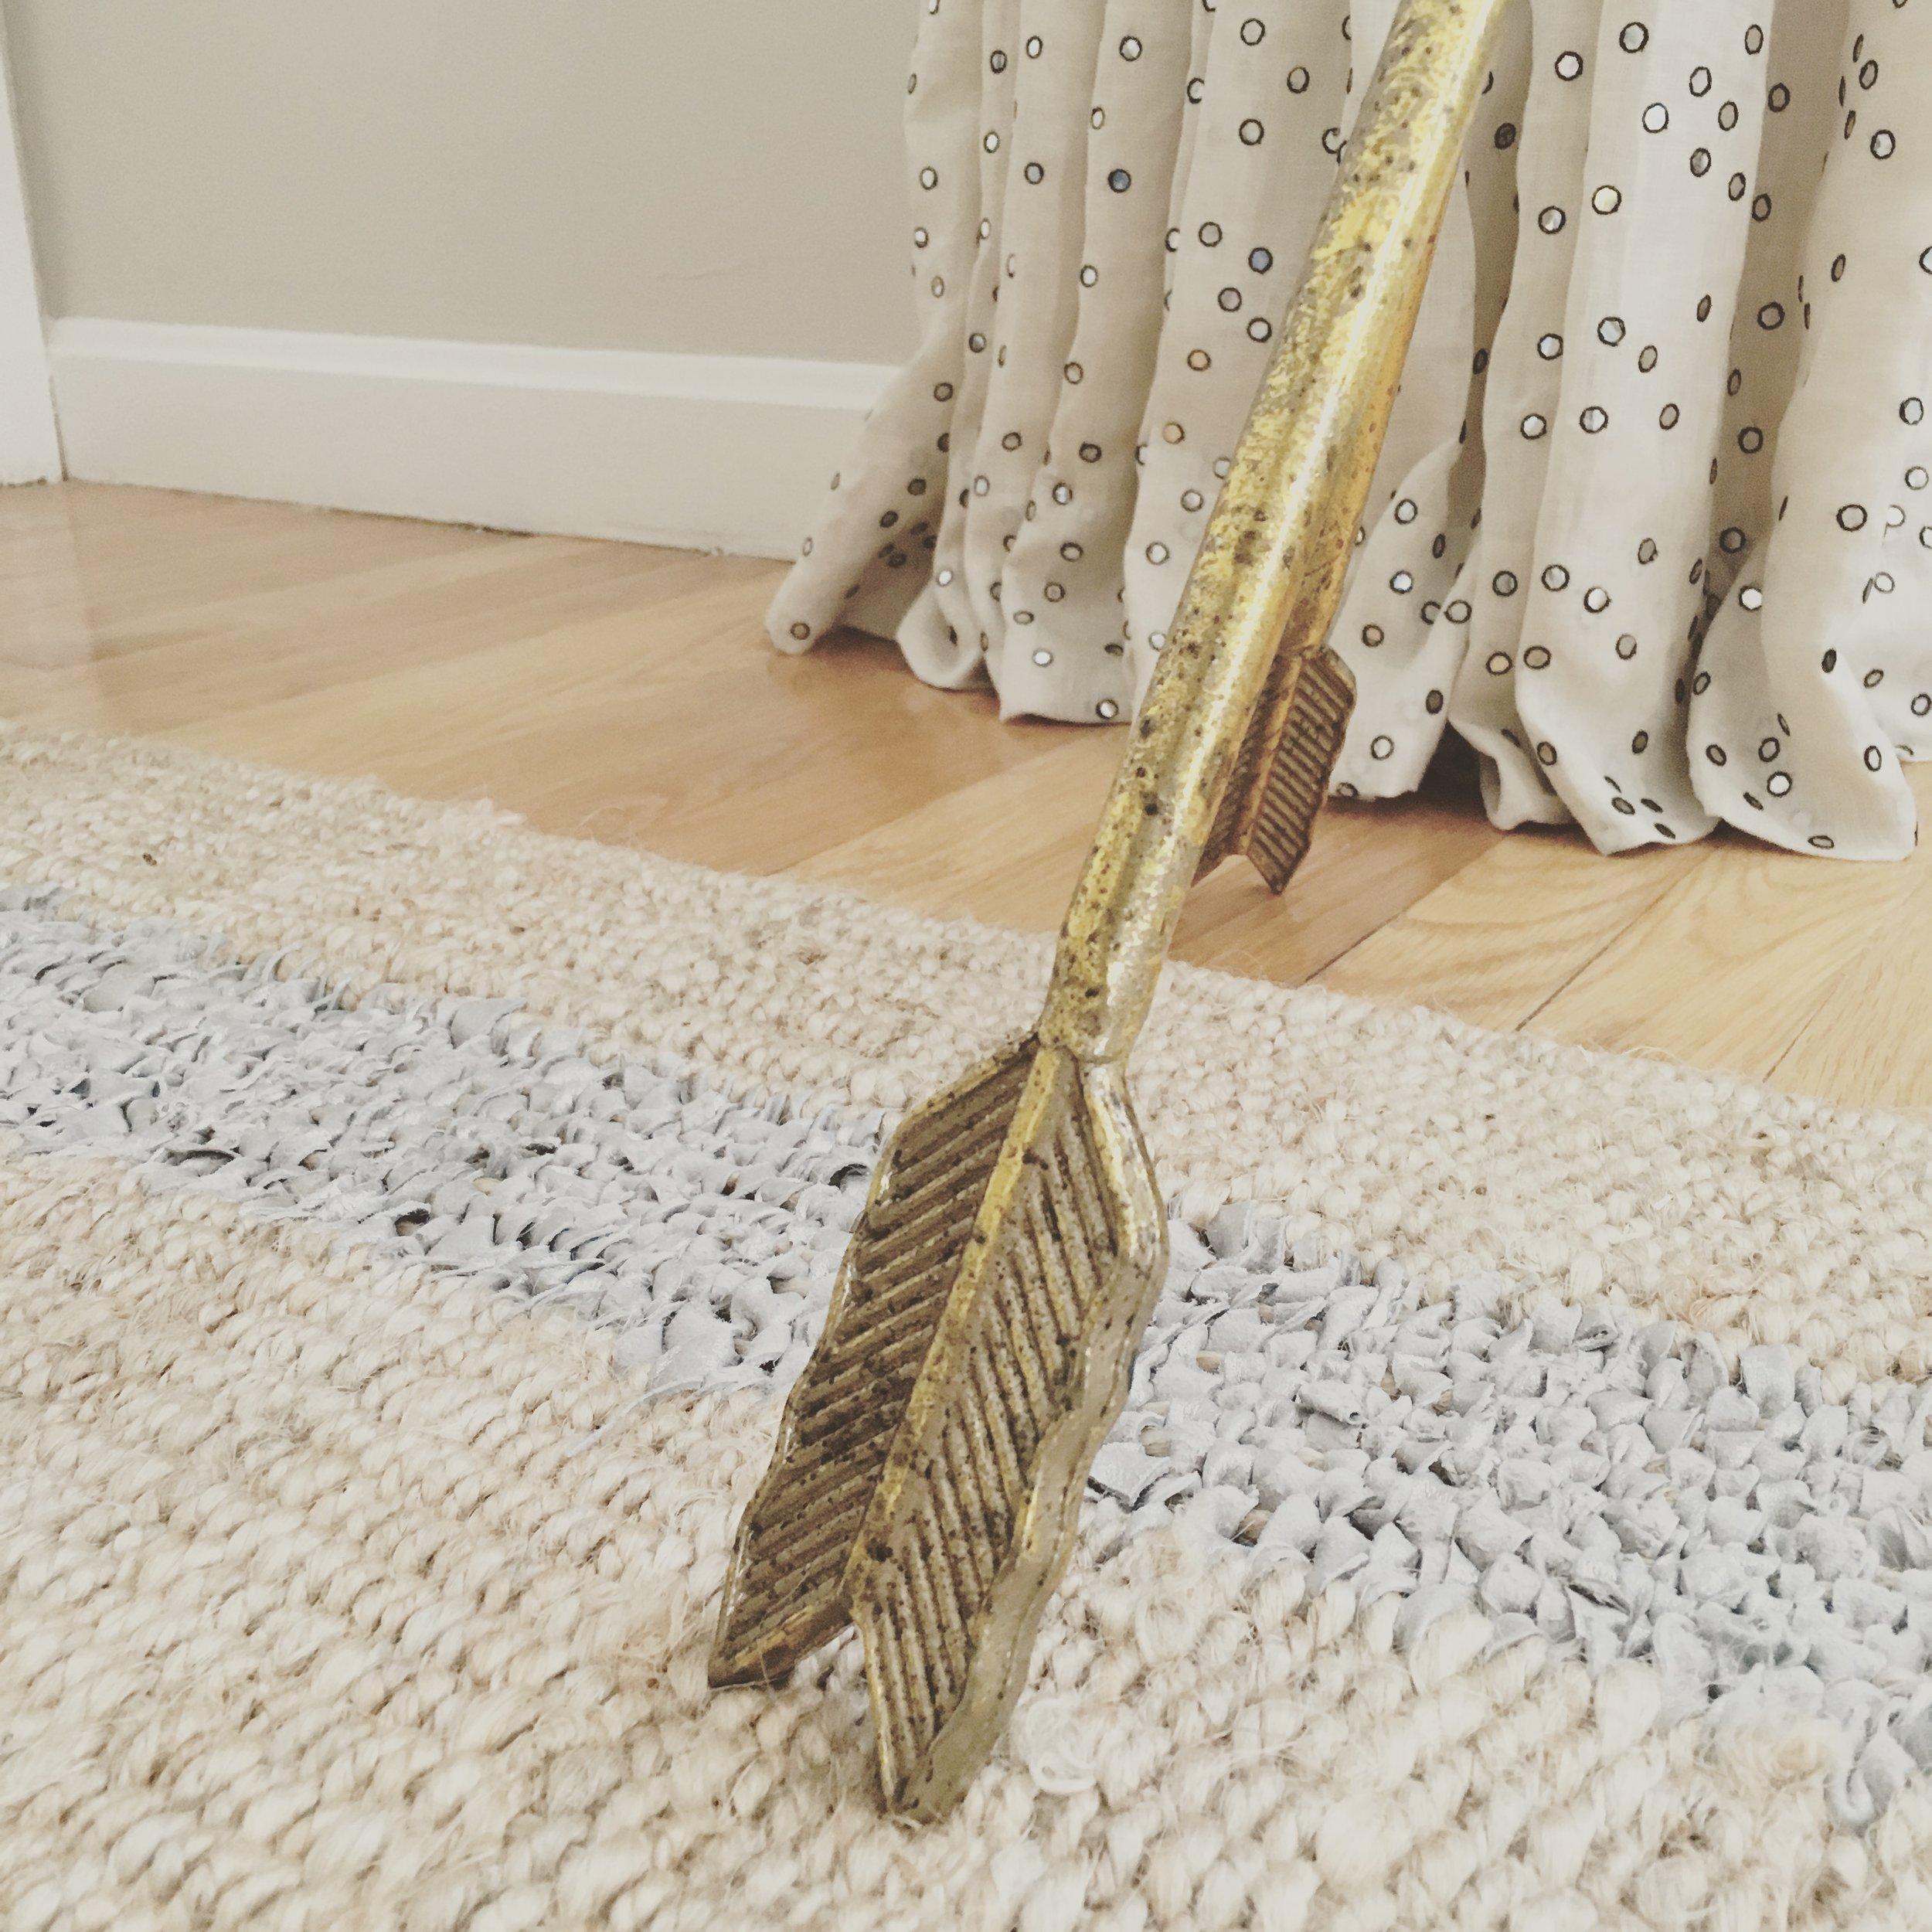 Gold arrow side table leg with a metallic stripe Seagrams rug